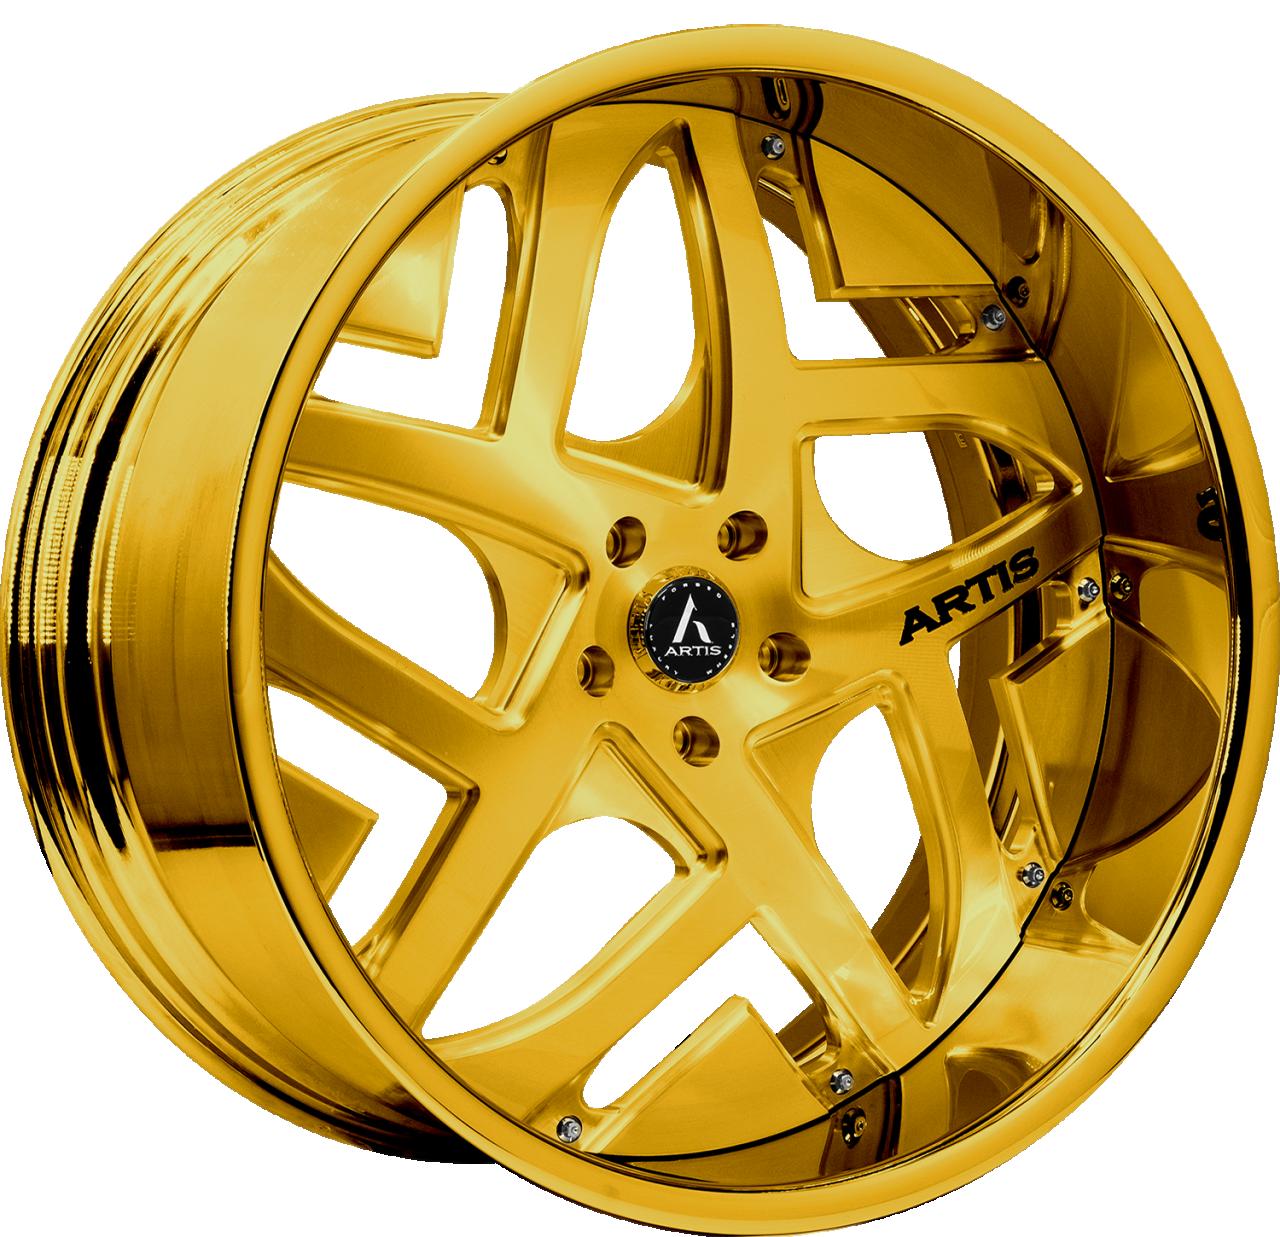 Artis Forged Pueblo wheel with Custom Gold finish